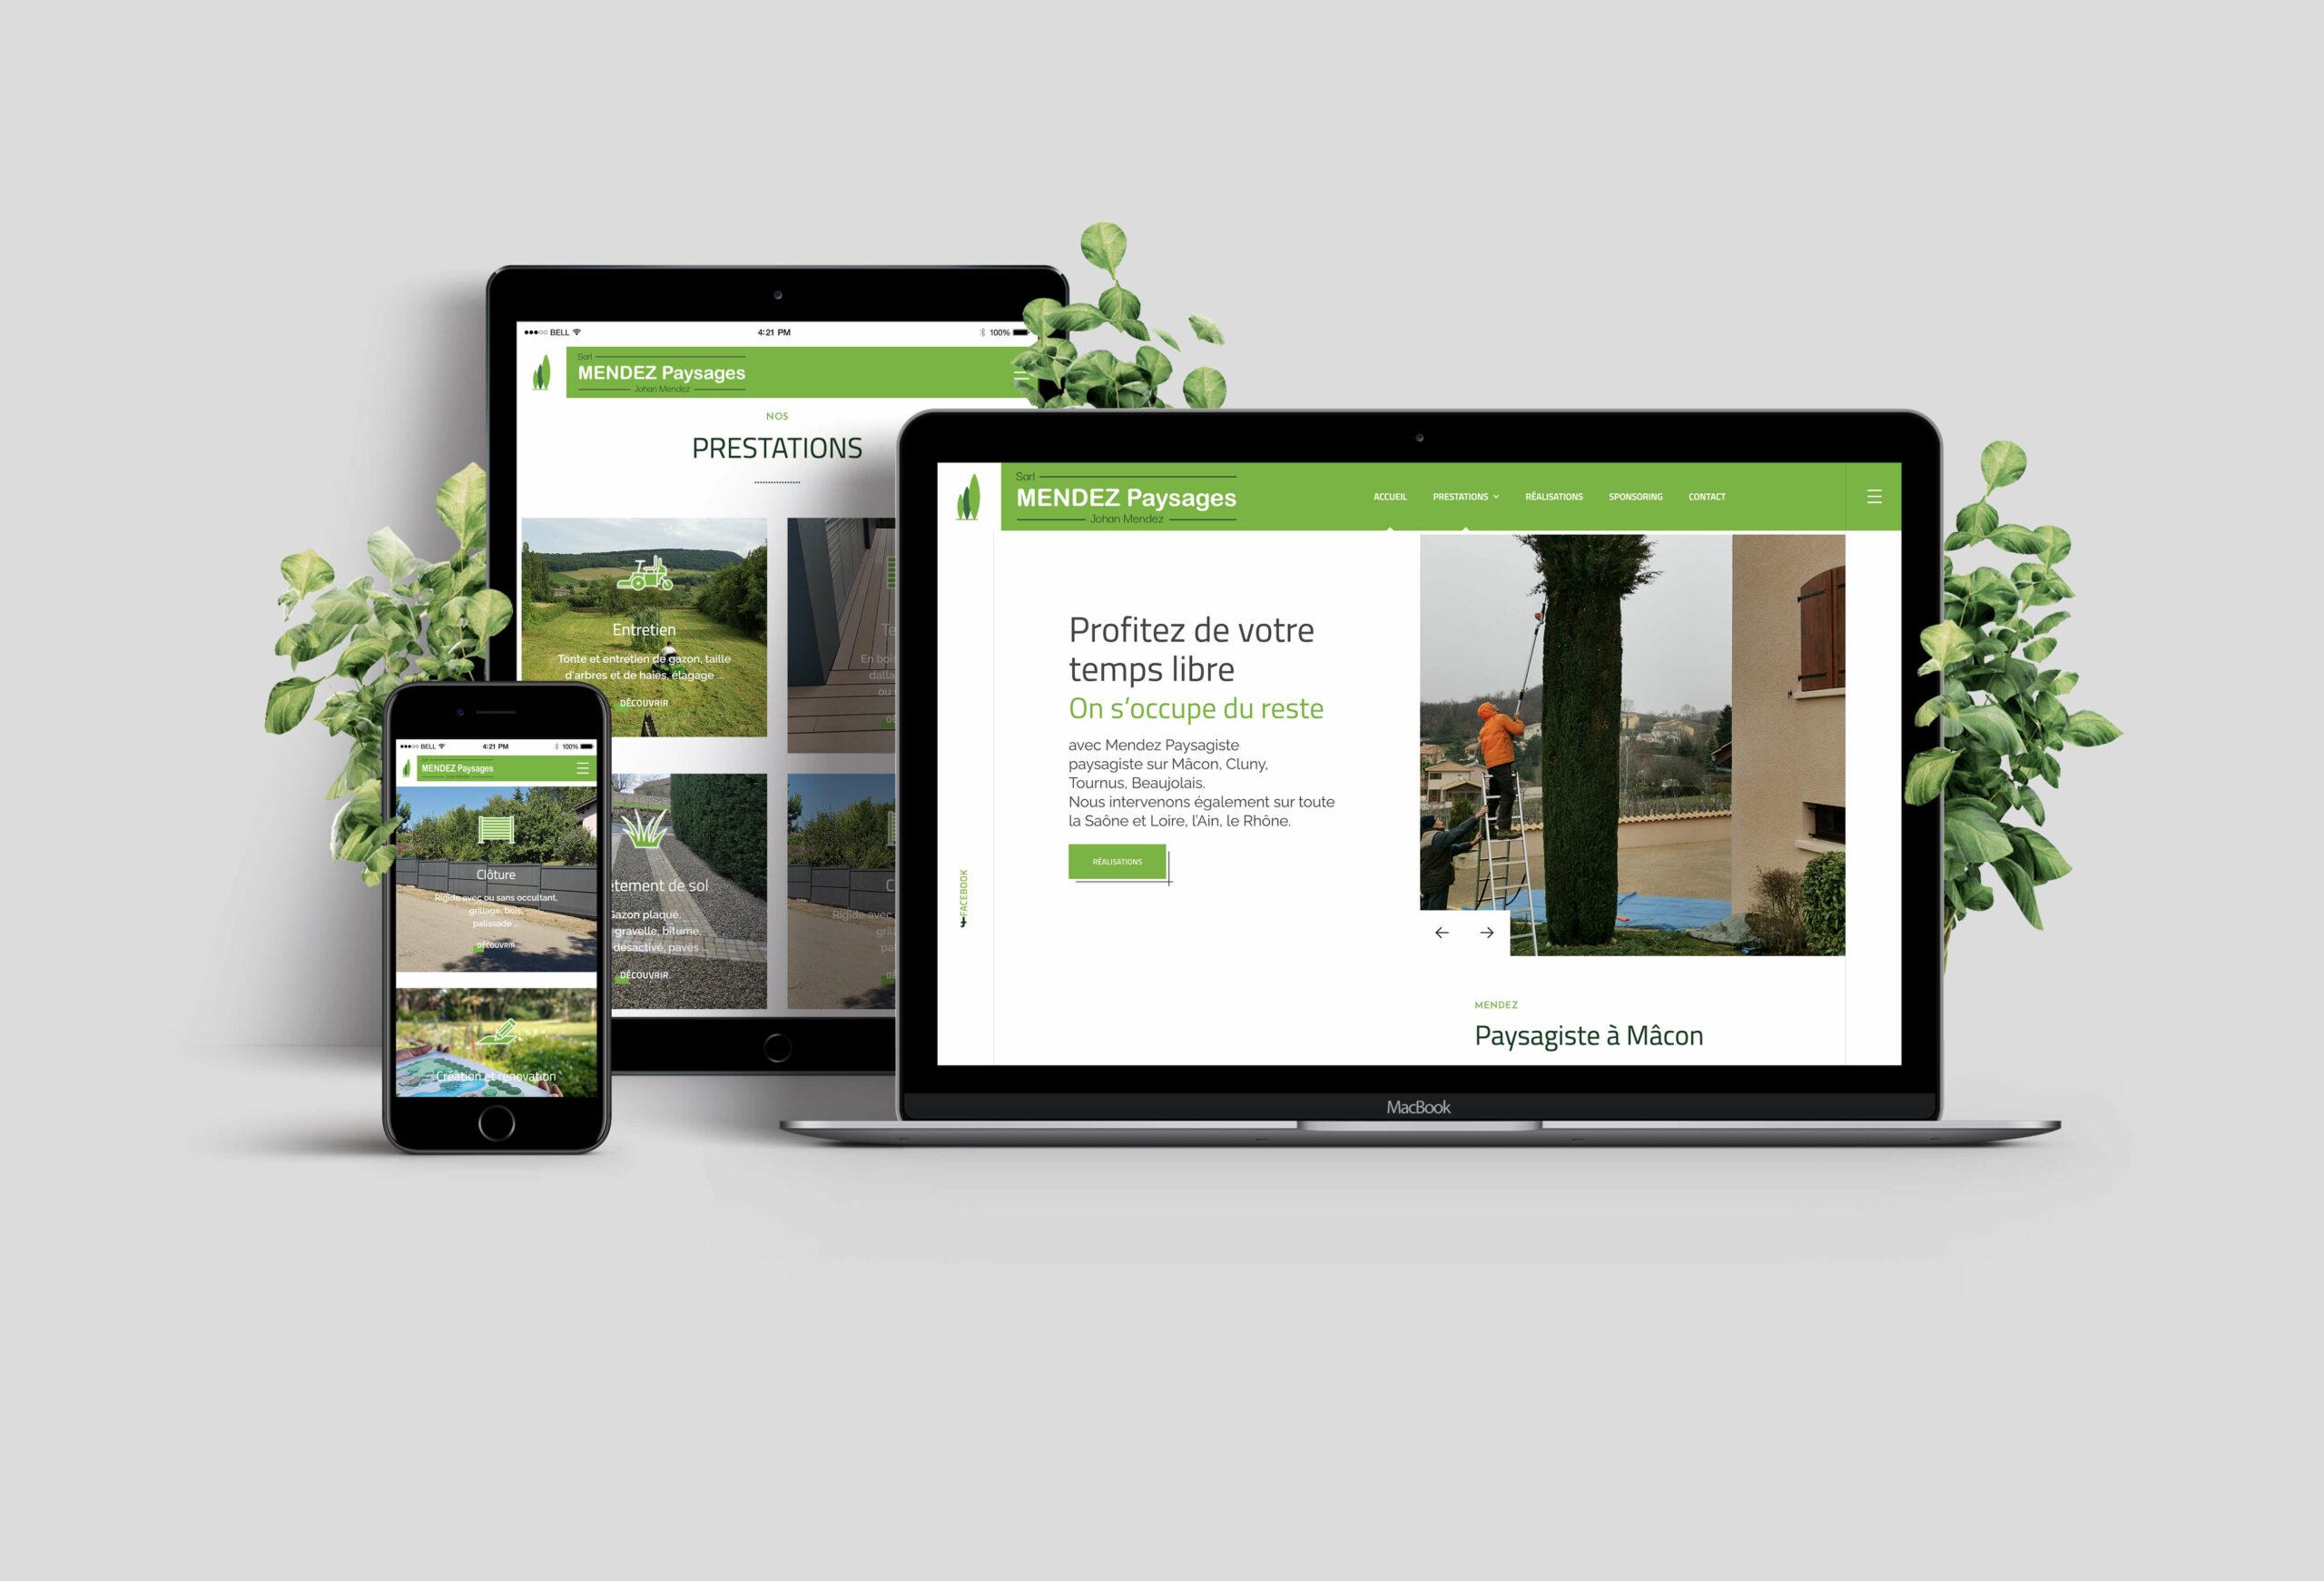 mockup site web mendez paysages responsive